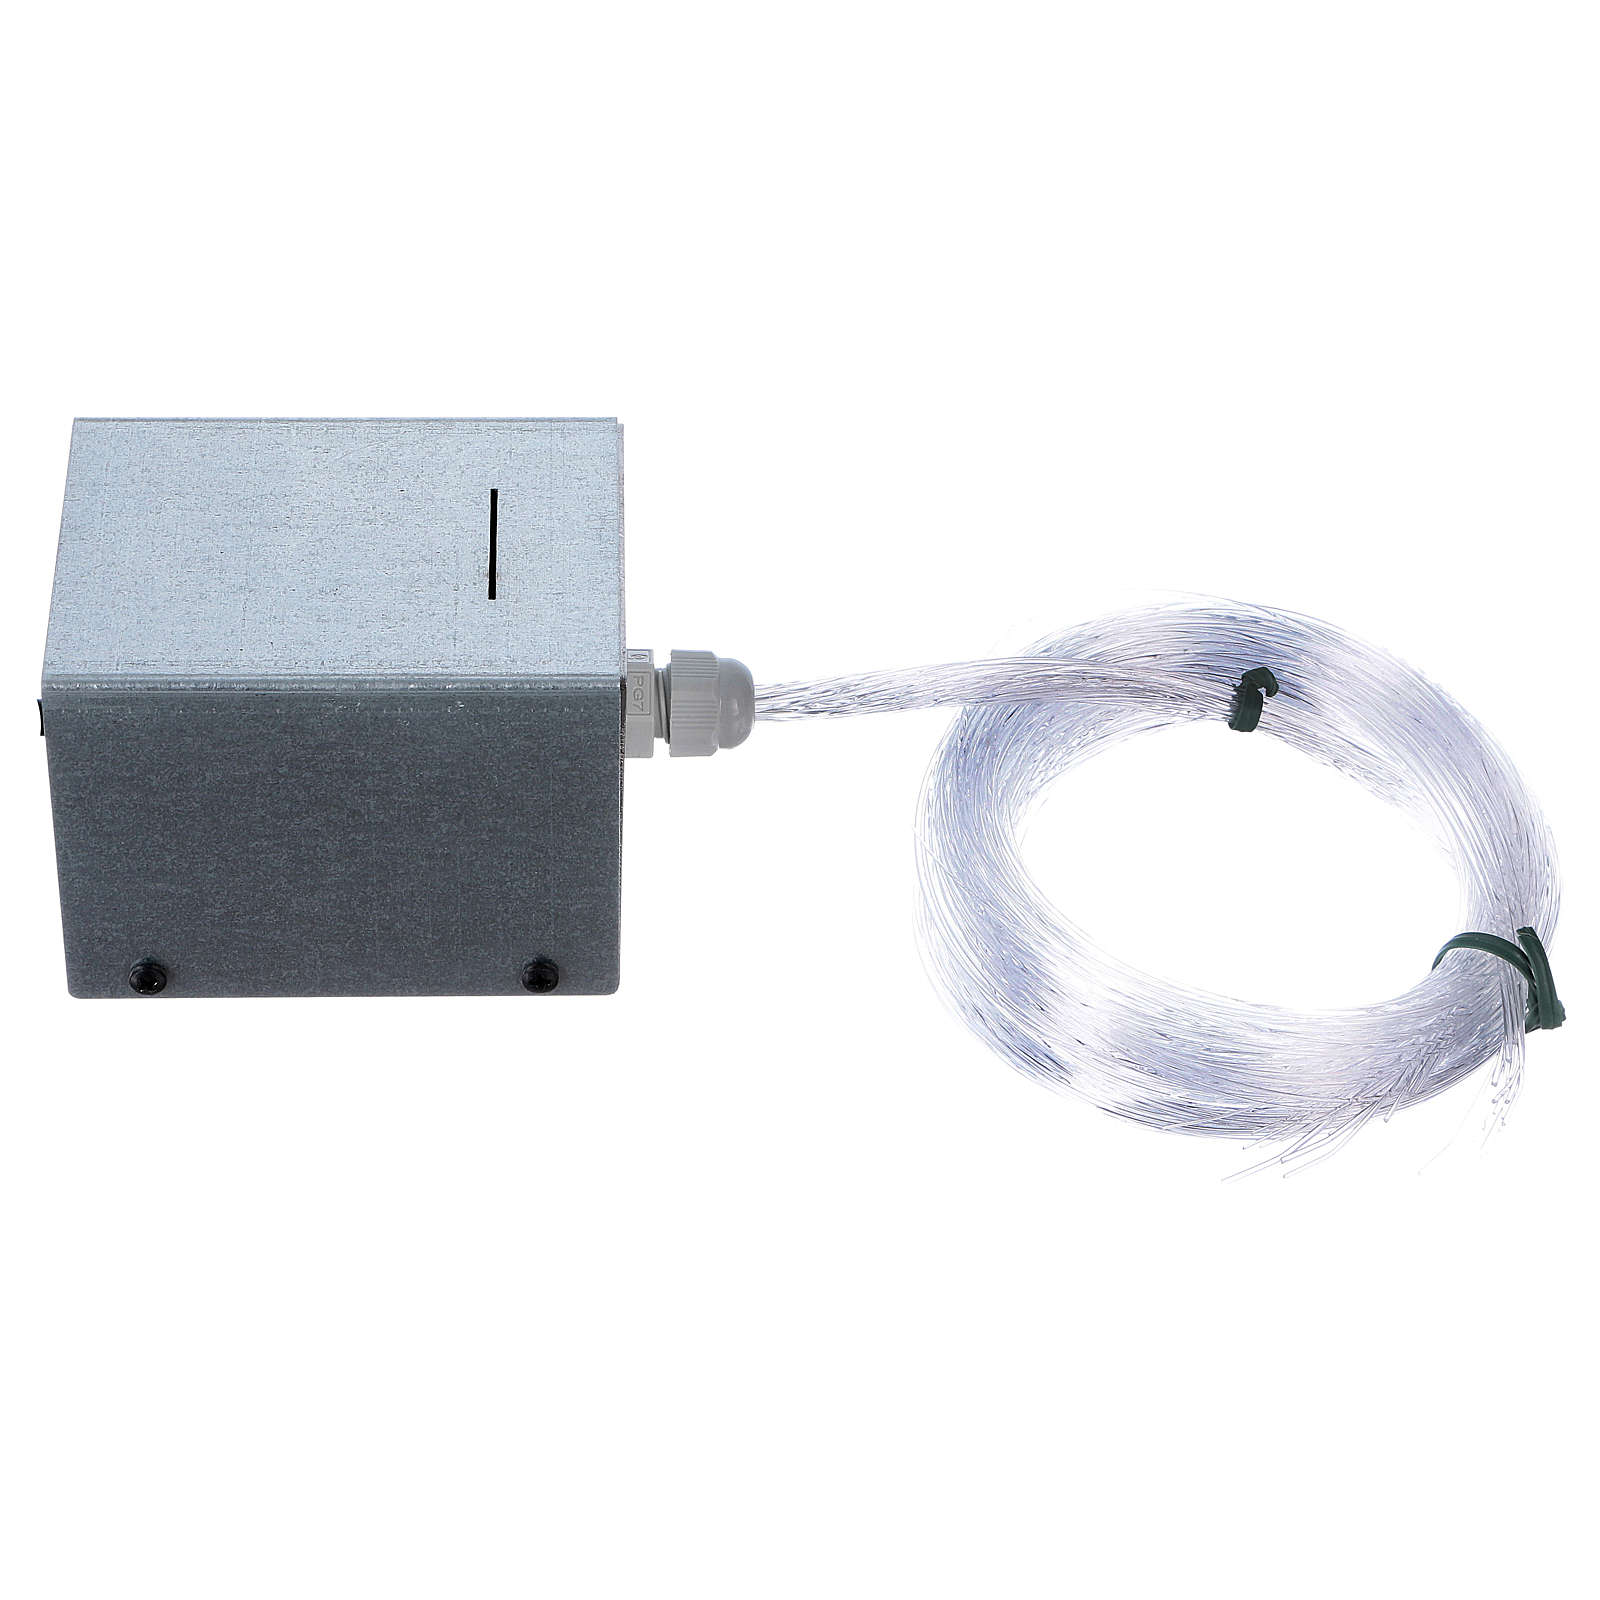 Control Unit for fiber optic stars Light Filter 30 assorted threads for Nativity scene 4